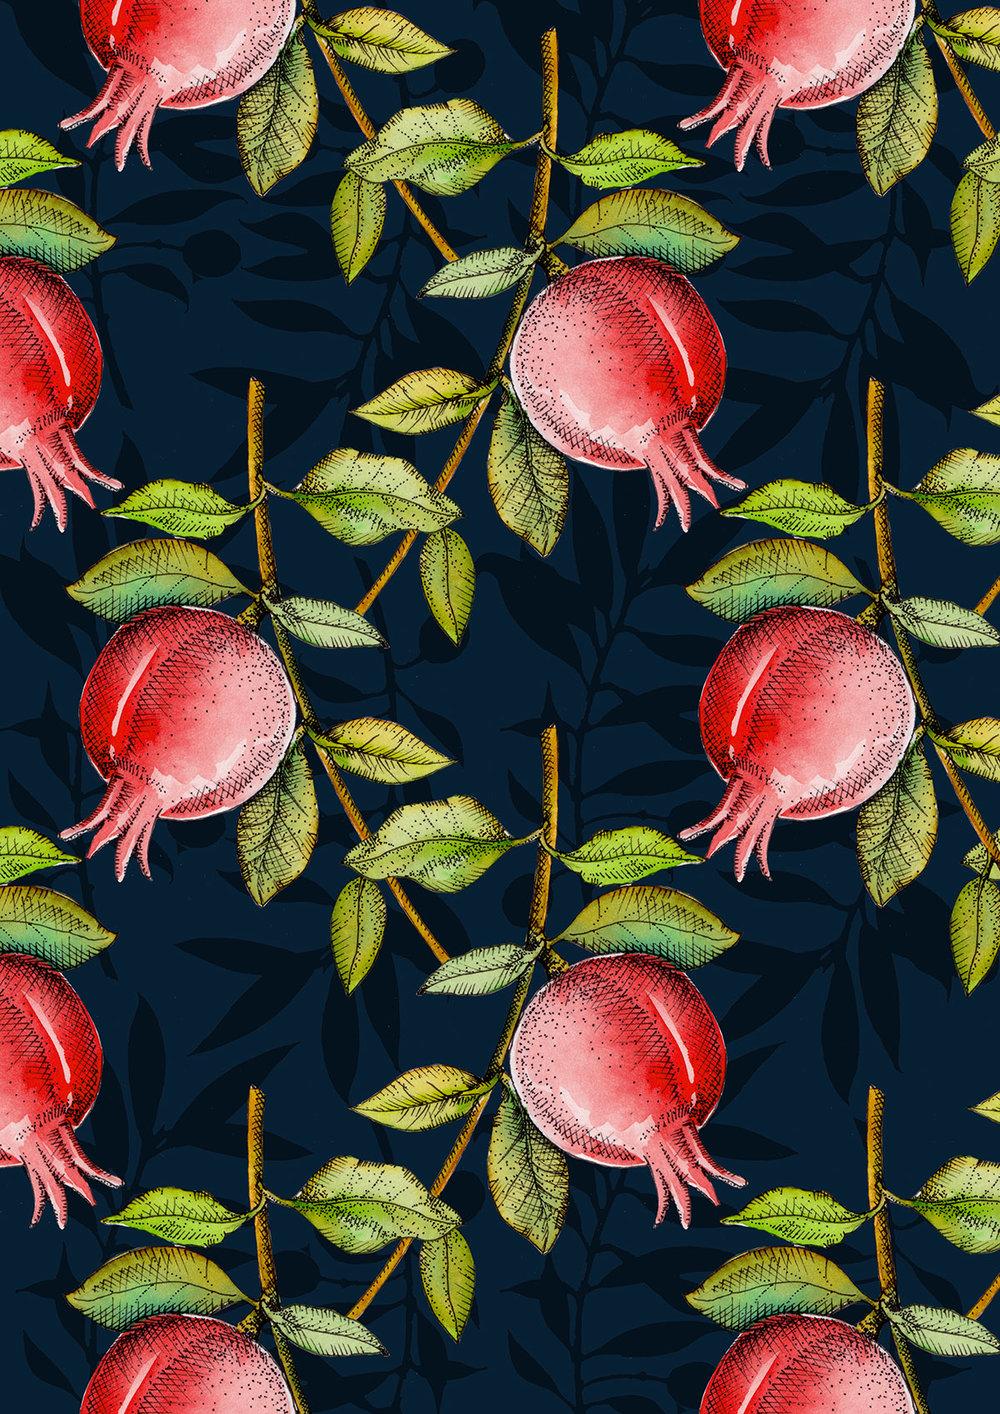 pomegranates.jpg